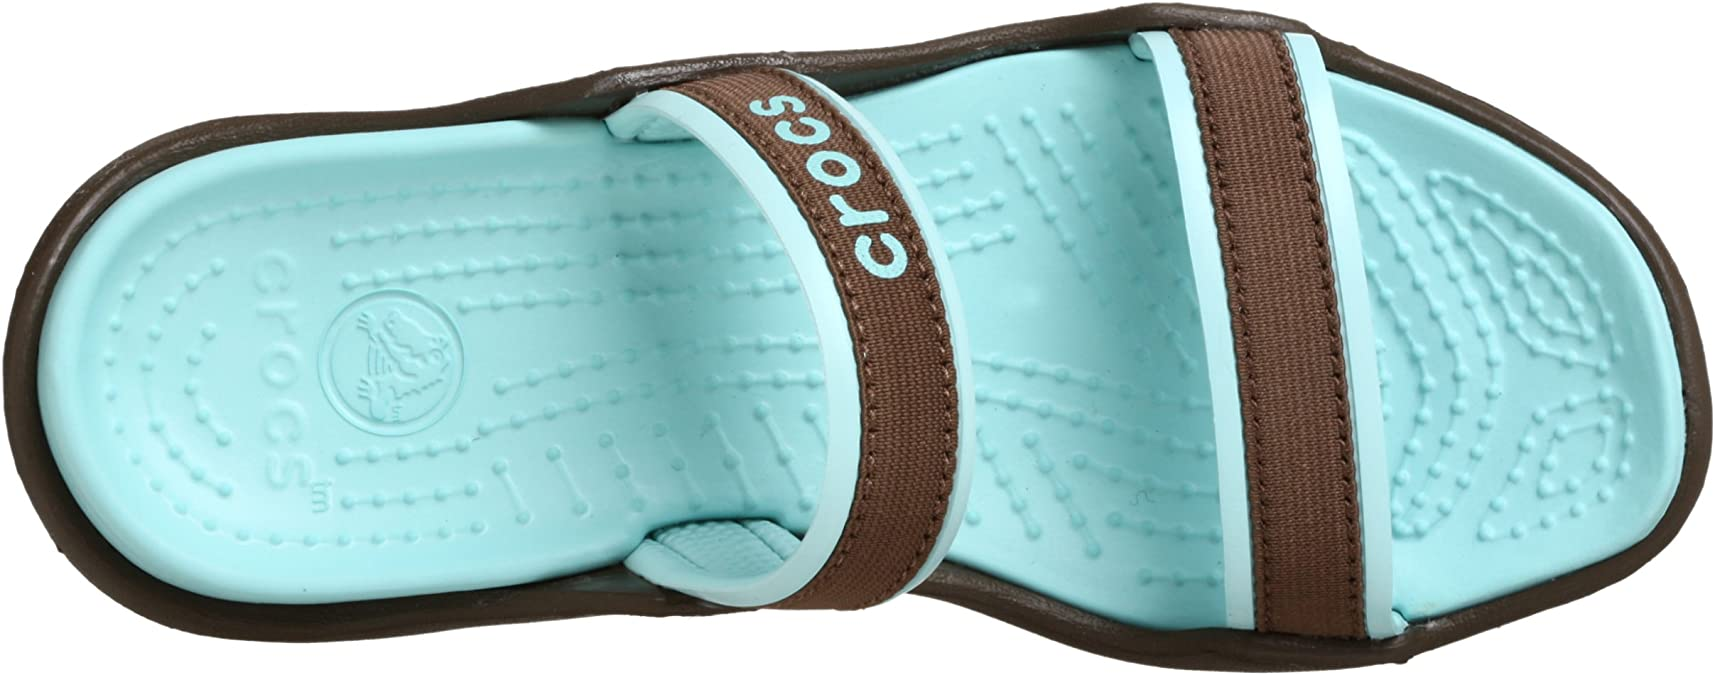 Patra Crocs Slip On Sandals chocolatye seafoam